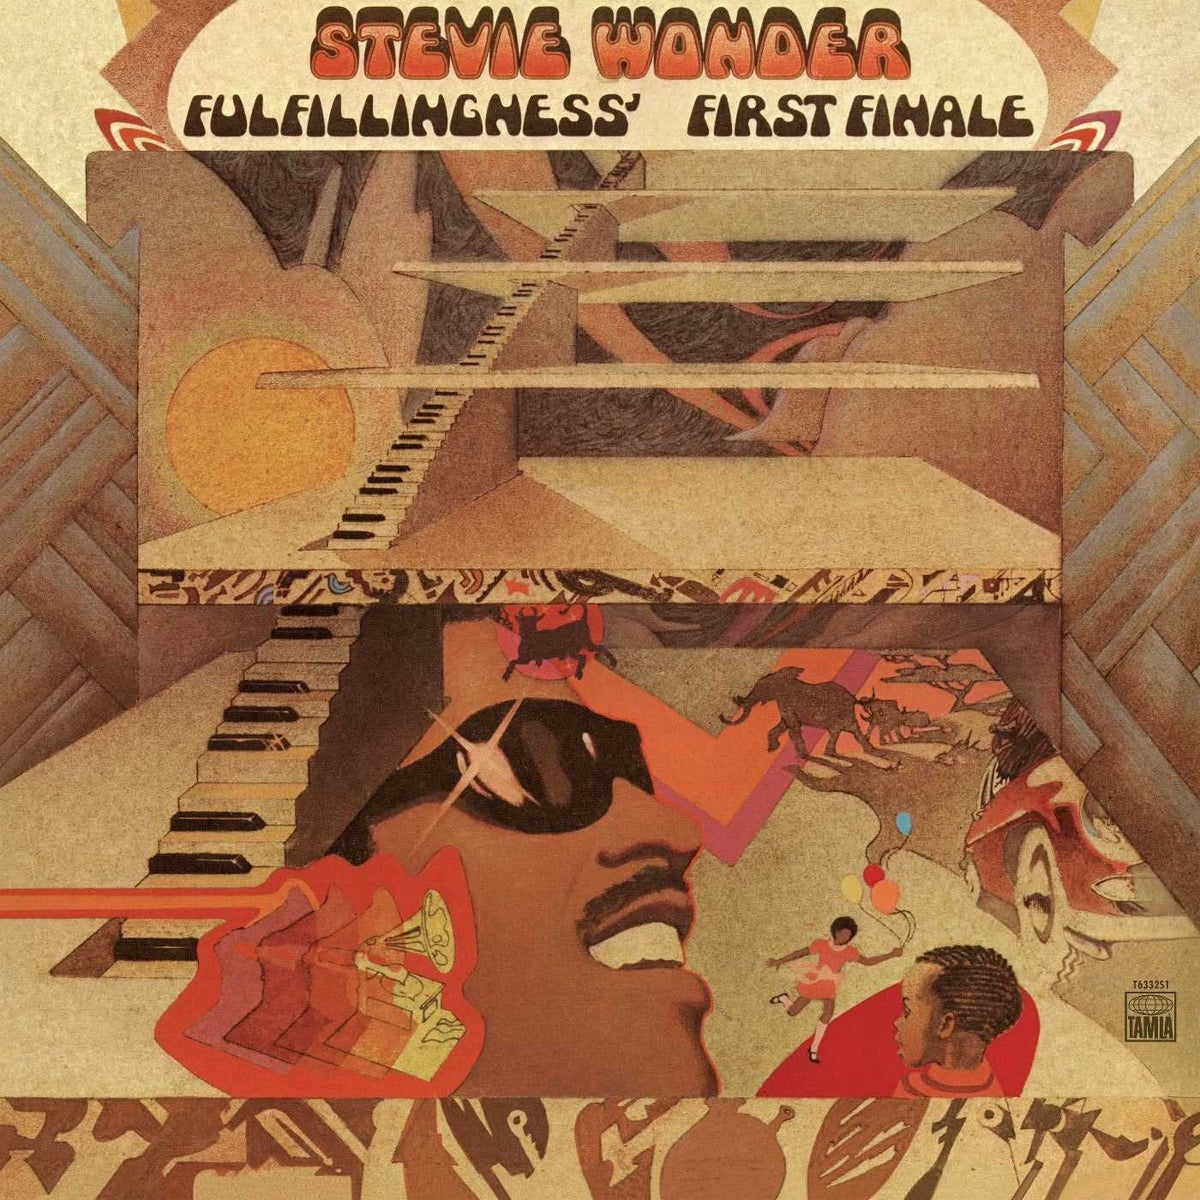 Image of Stevie Wonder - Fulfillingness' First Finale